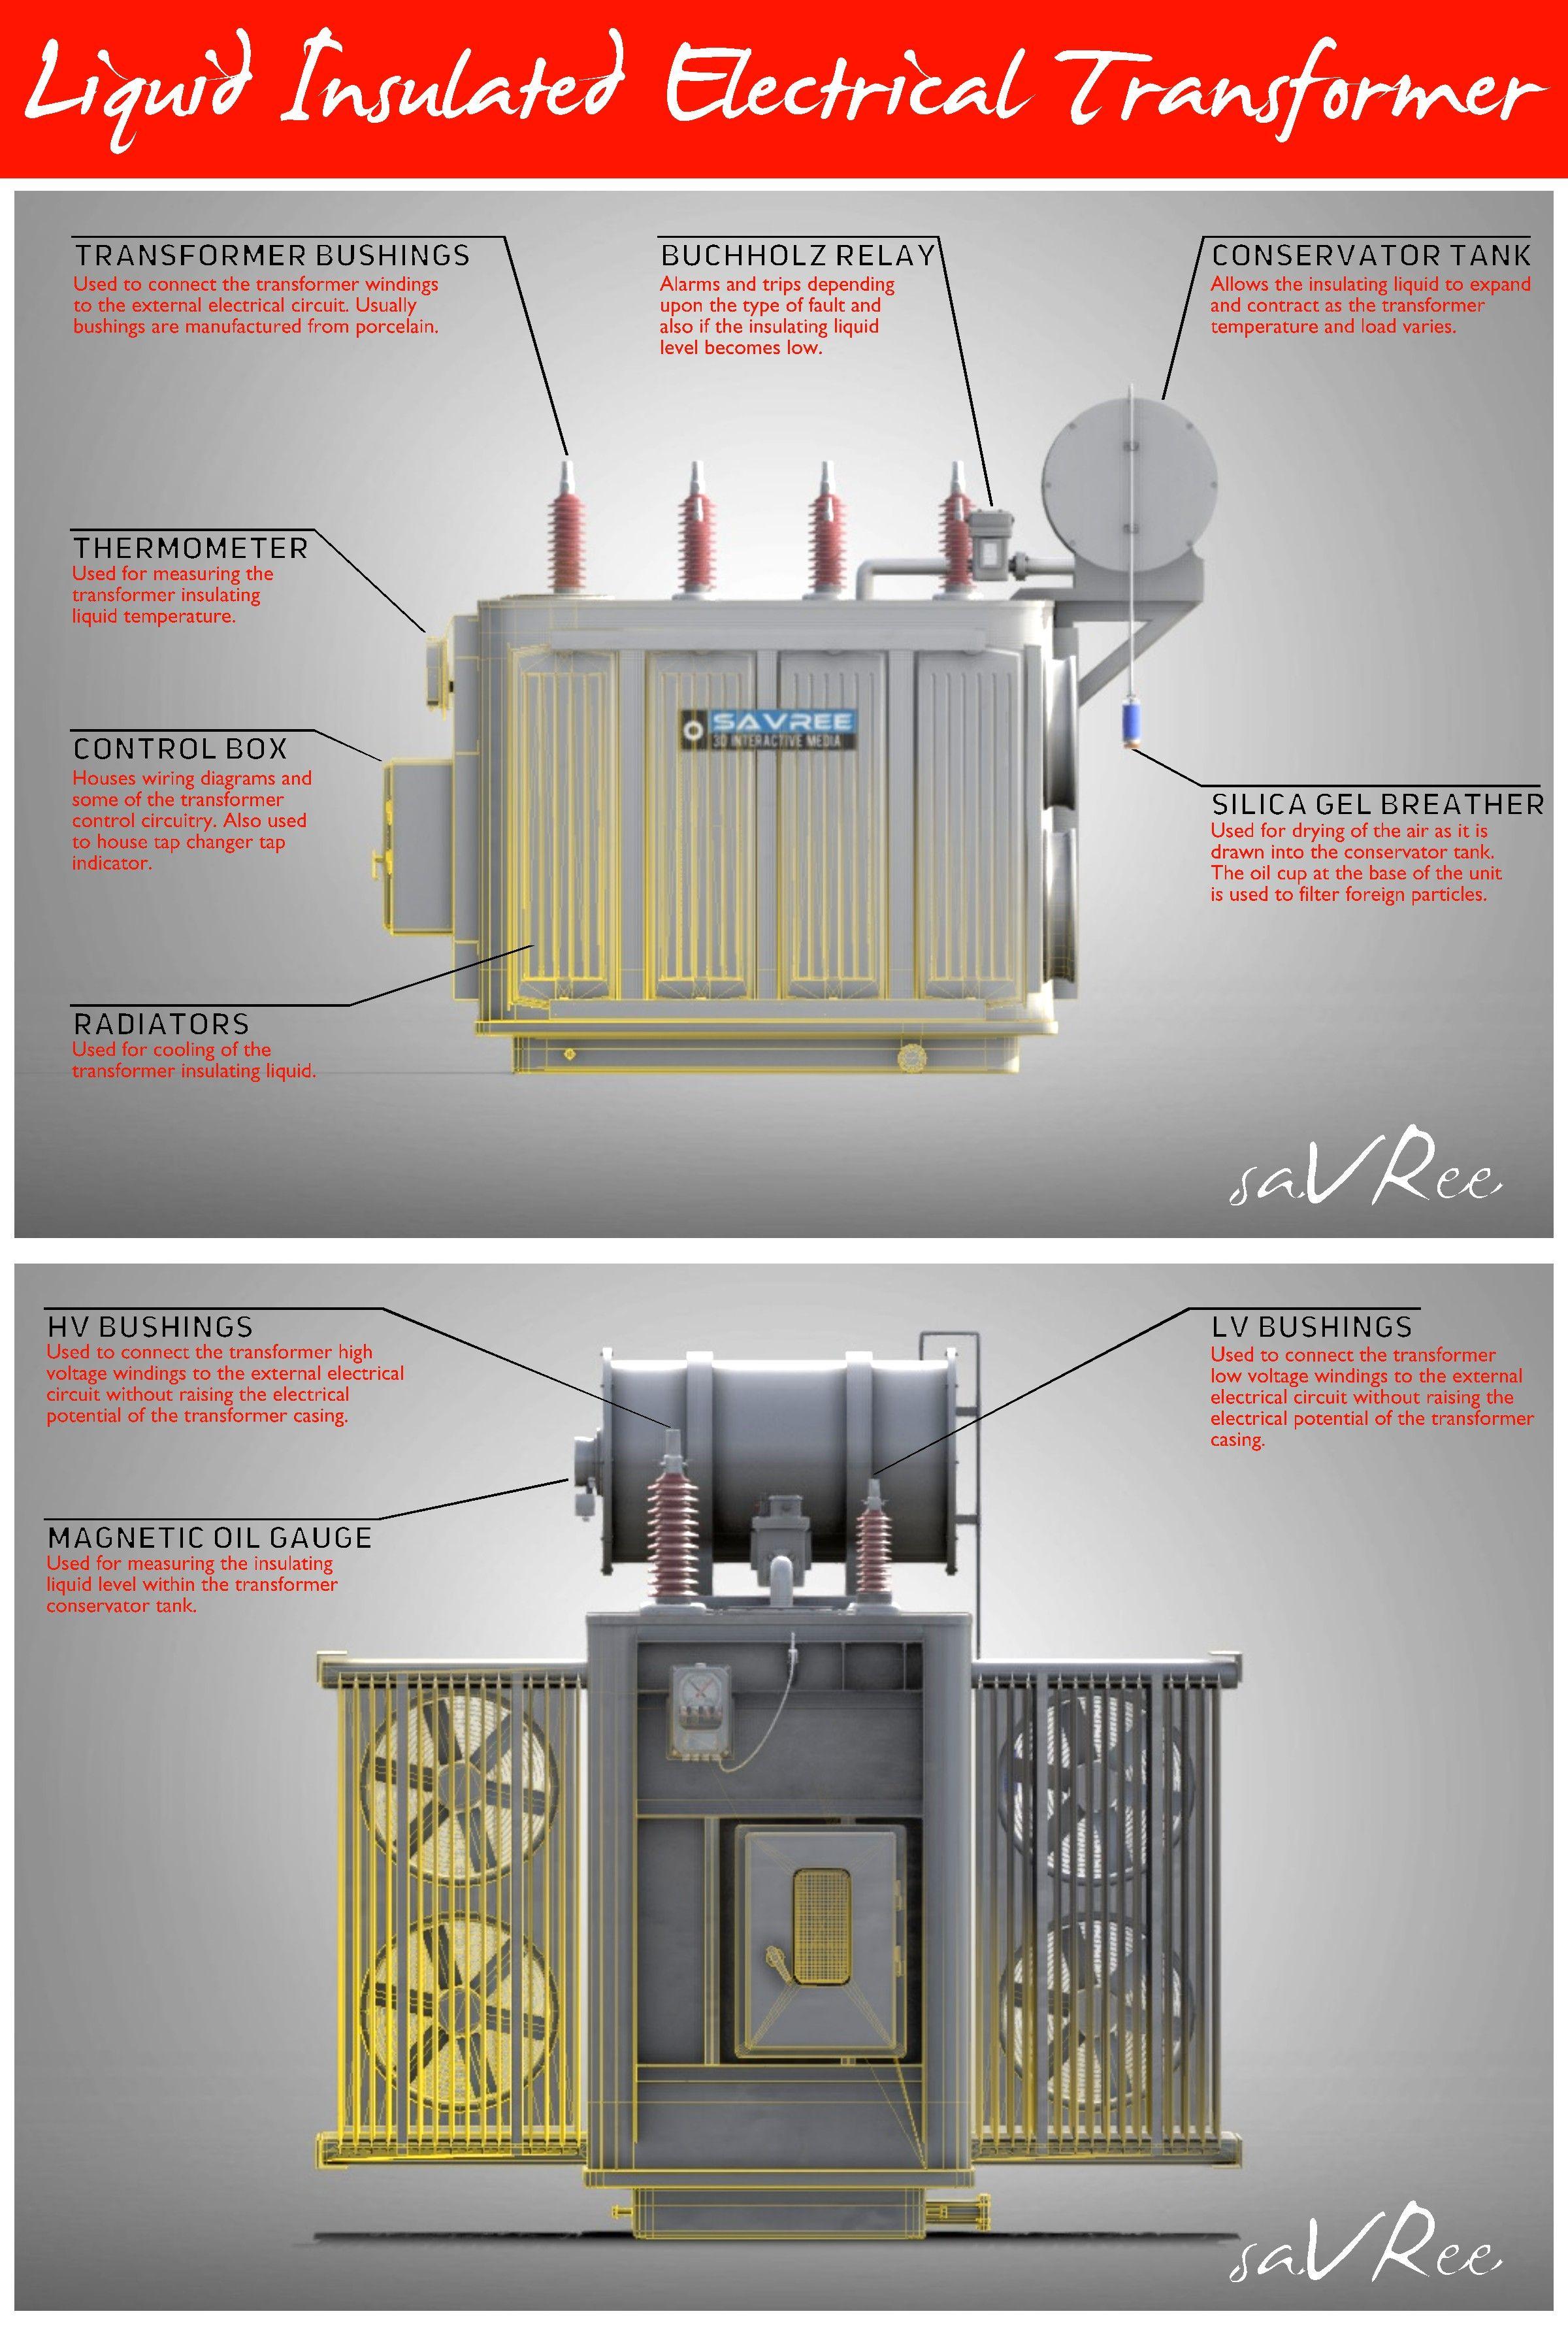 Liquid Insulated Electrical Transformer Electrical Transformers Power Engineering Electrical Engineering